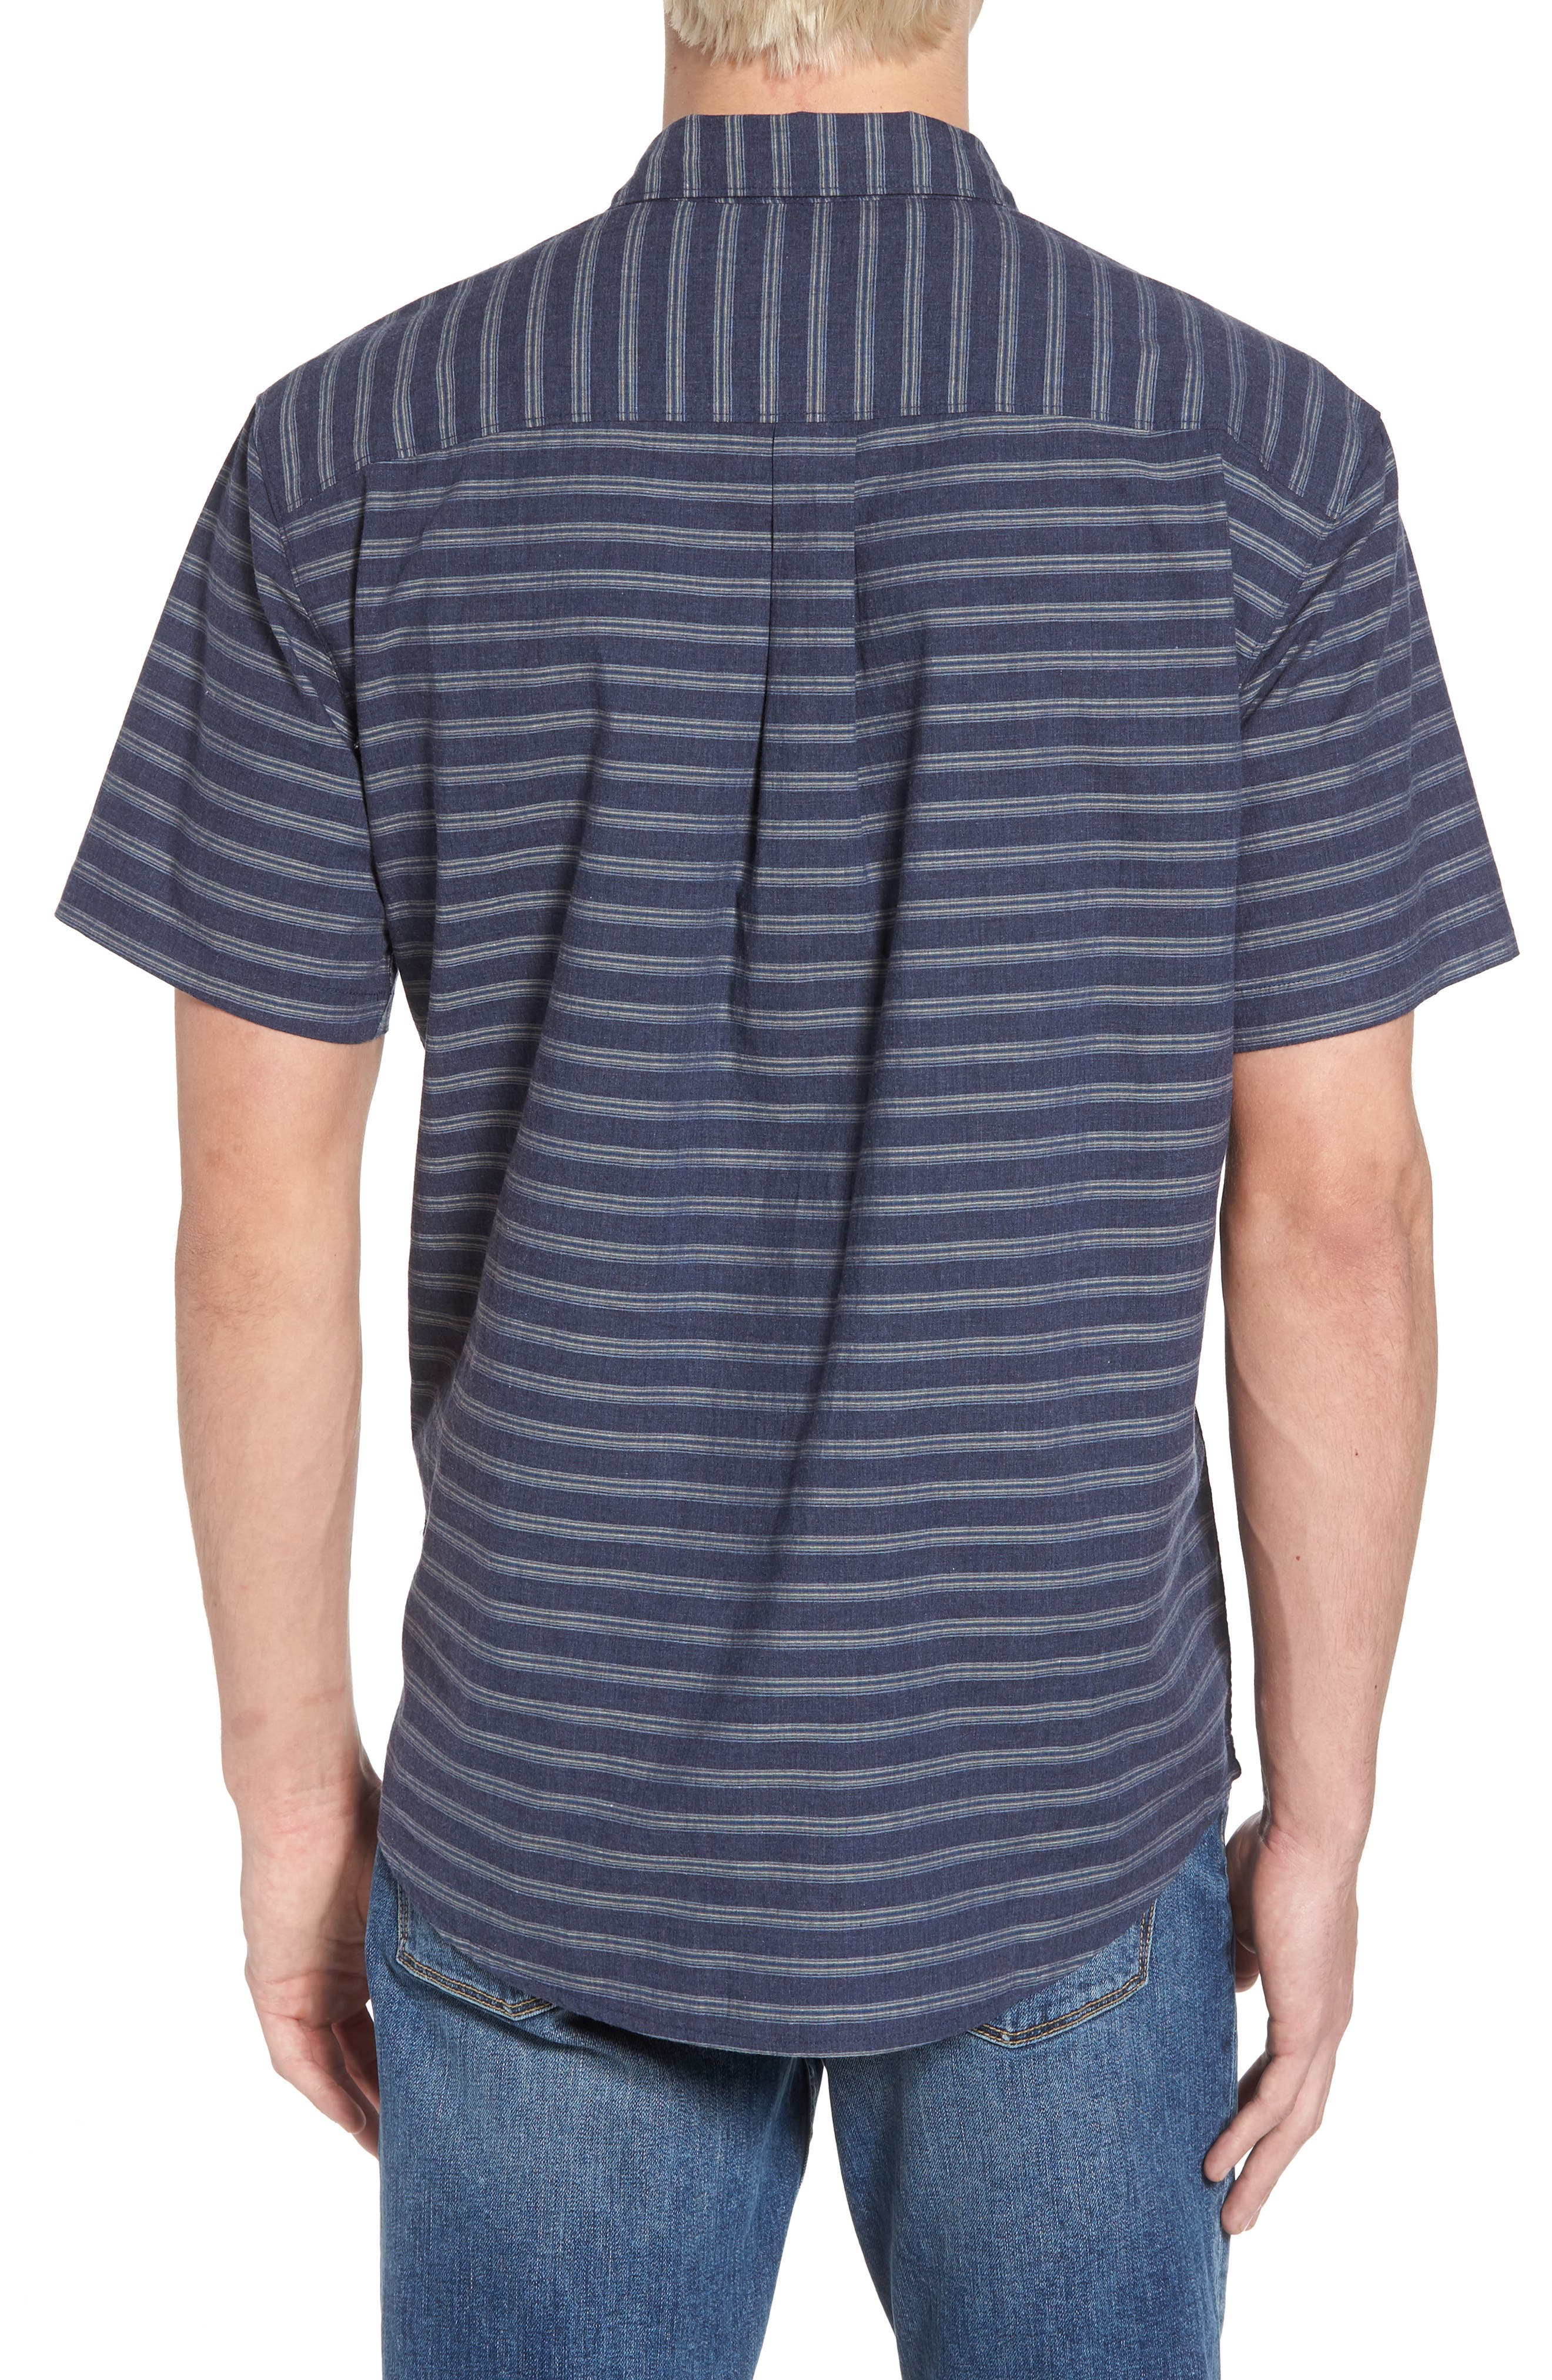 Stag Short Sleeve Shirt,                             Alternate thumbnail 2, color,